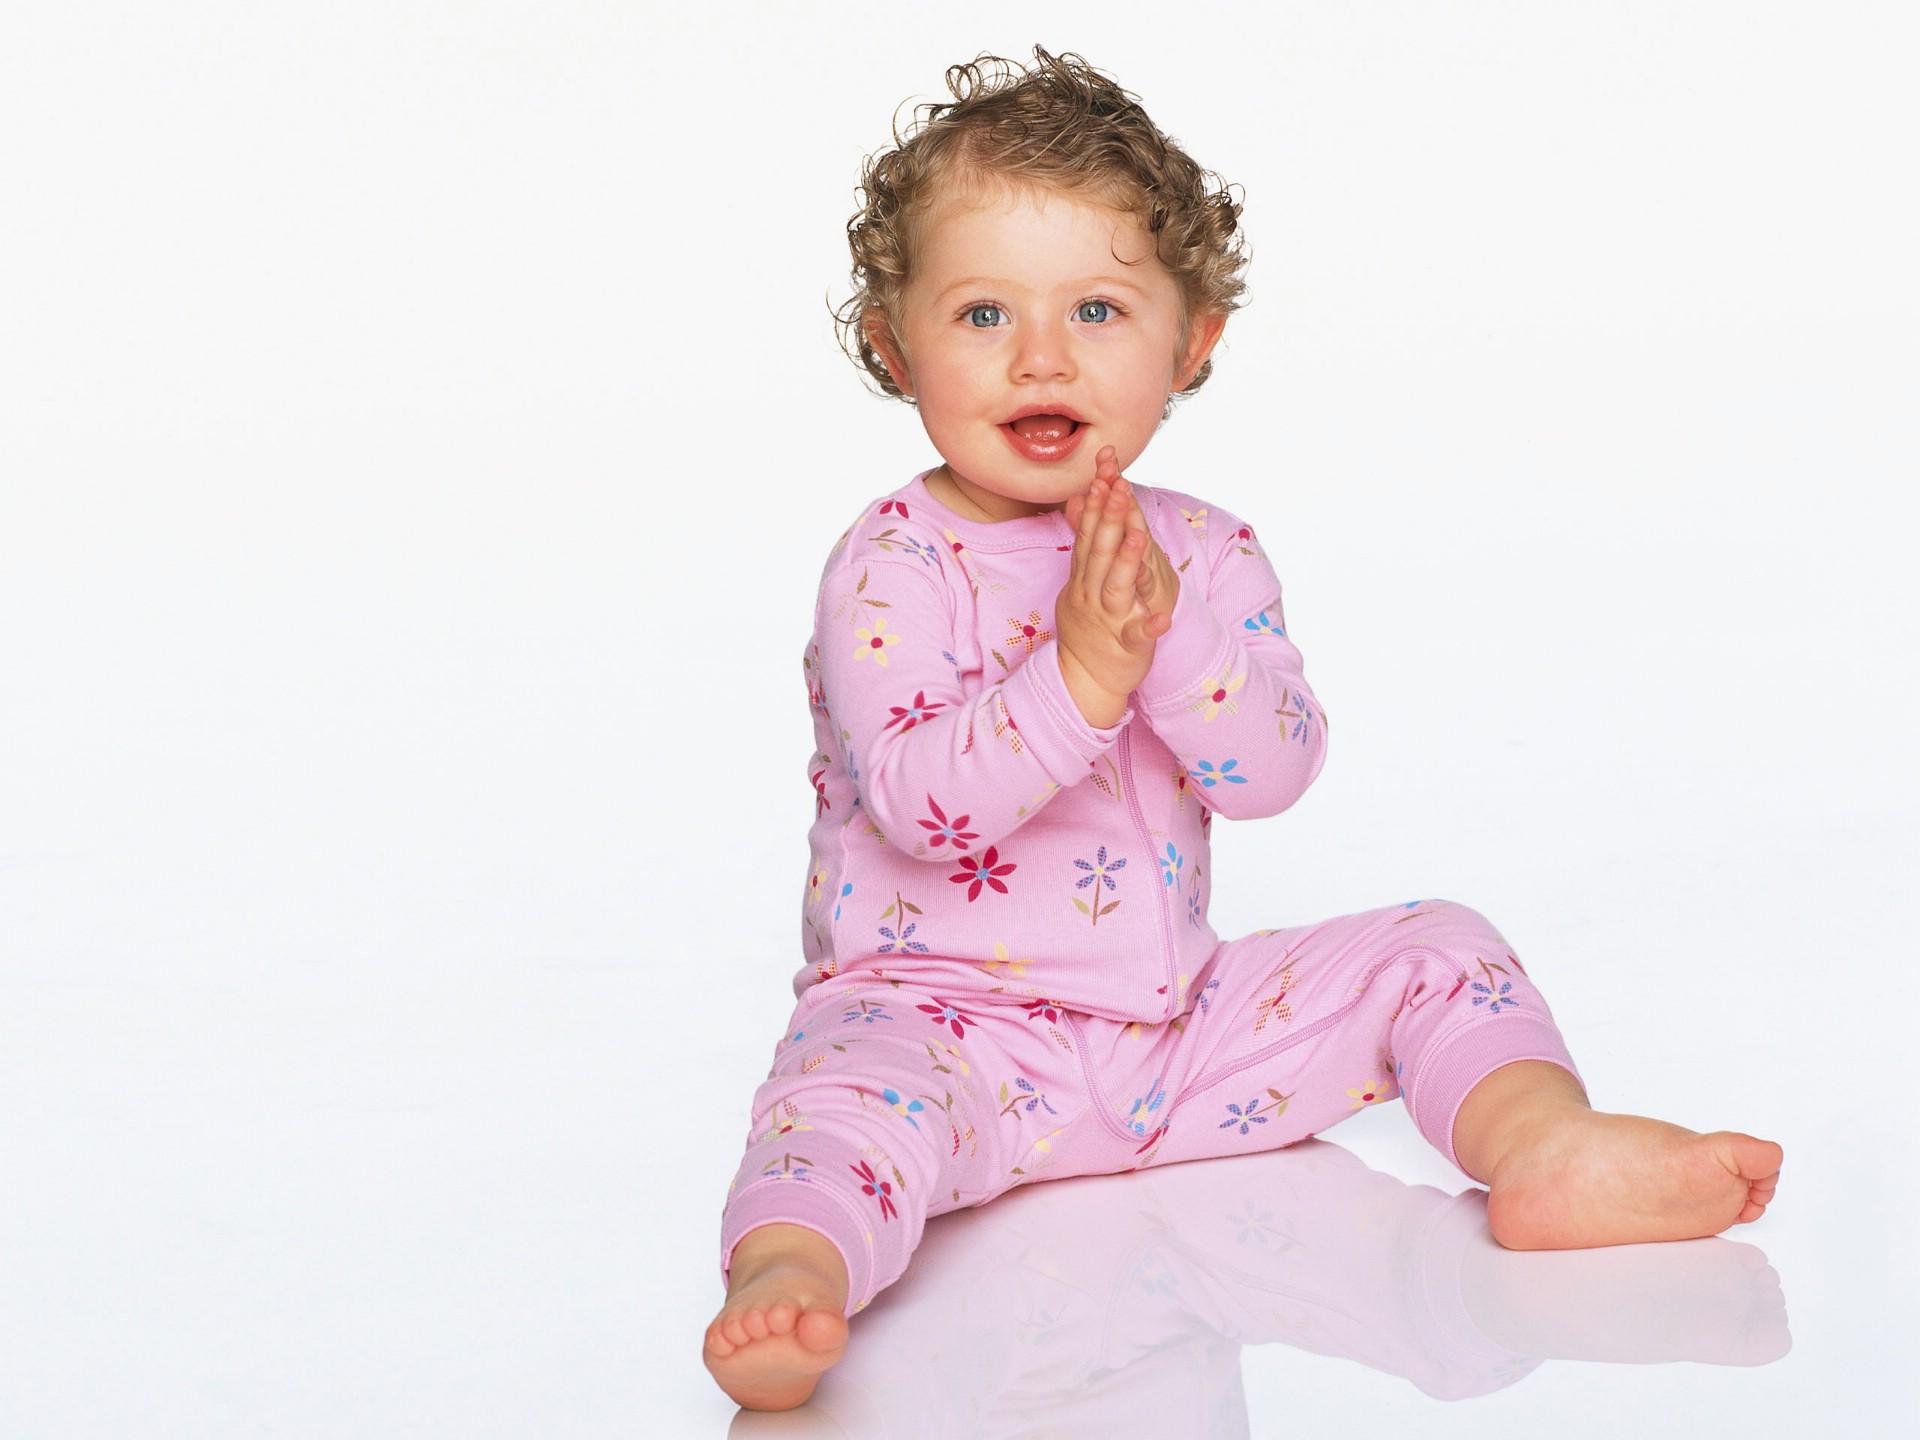 Boy Girl Kiss Hd Wallpaper Cute Baby Hd 8 Wallpapers Hd Wallpapers Id 375